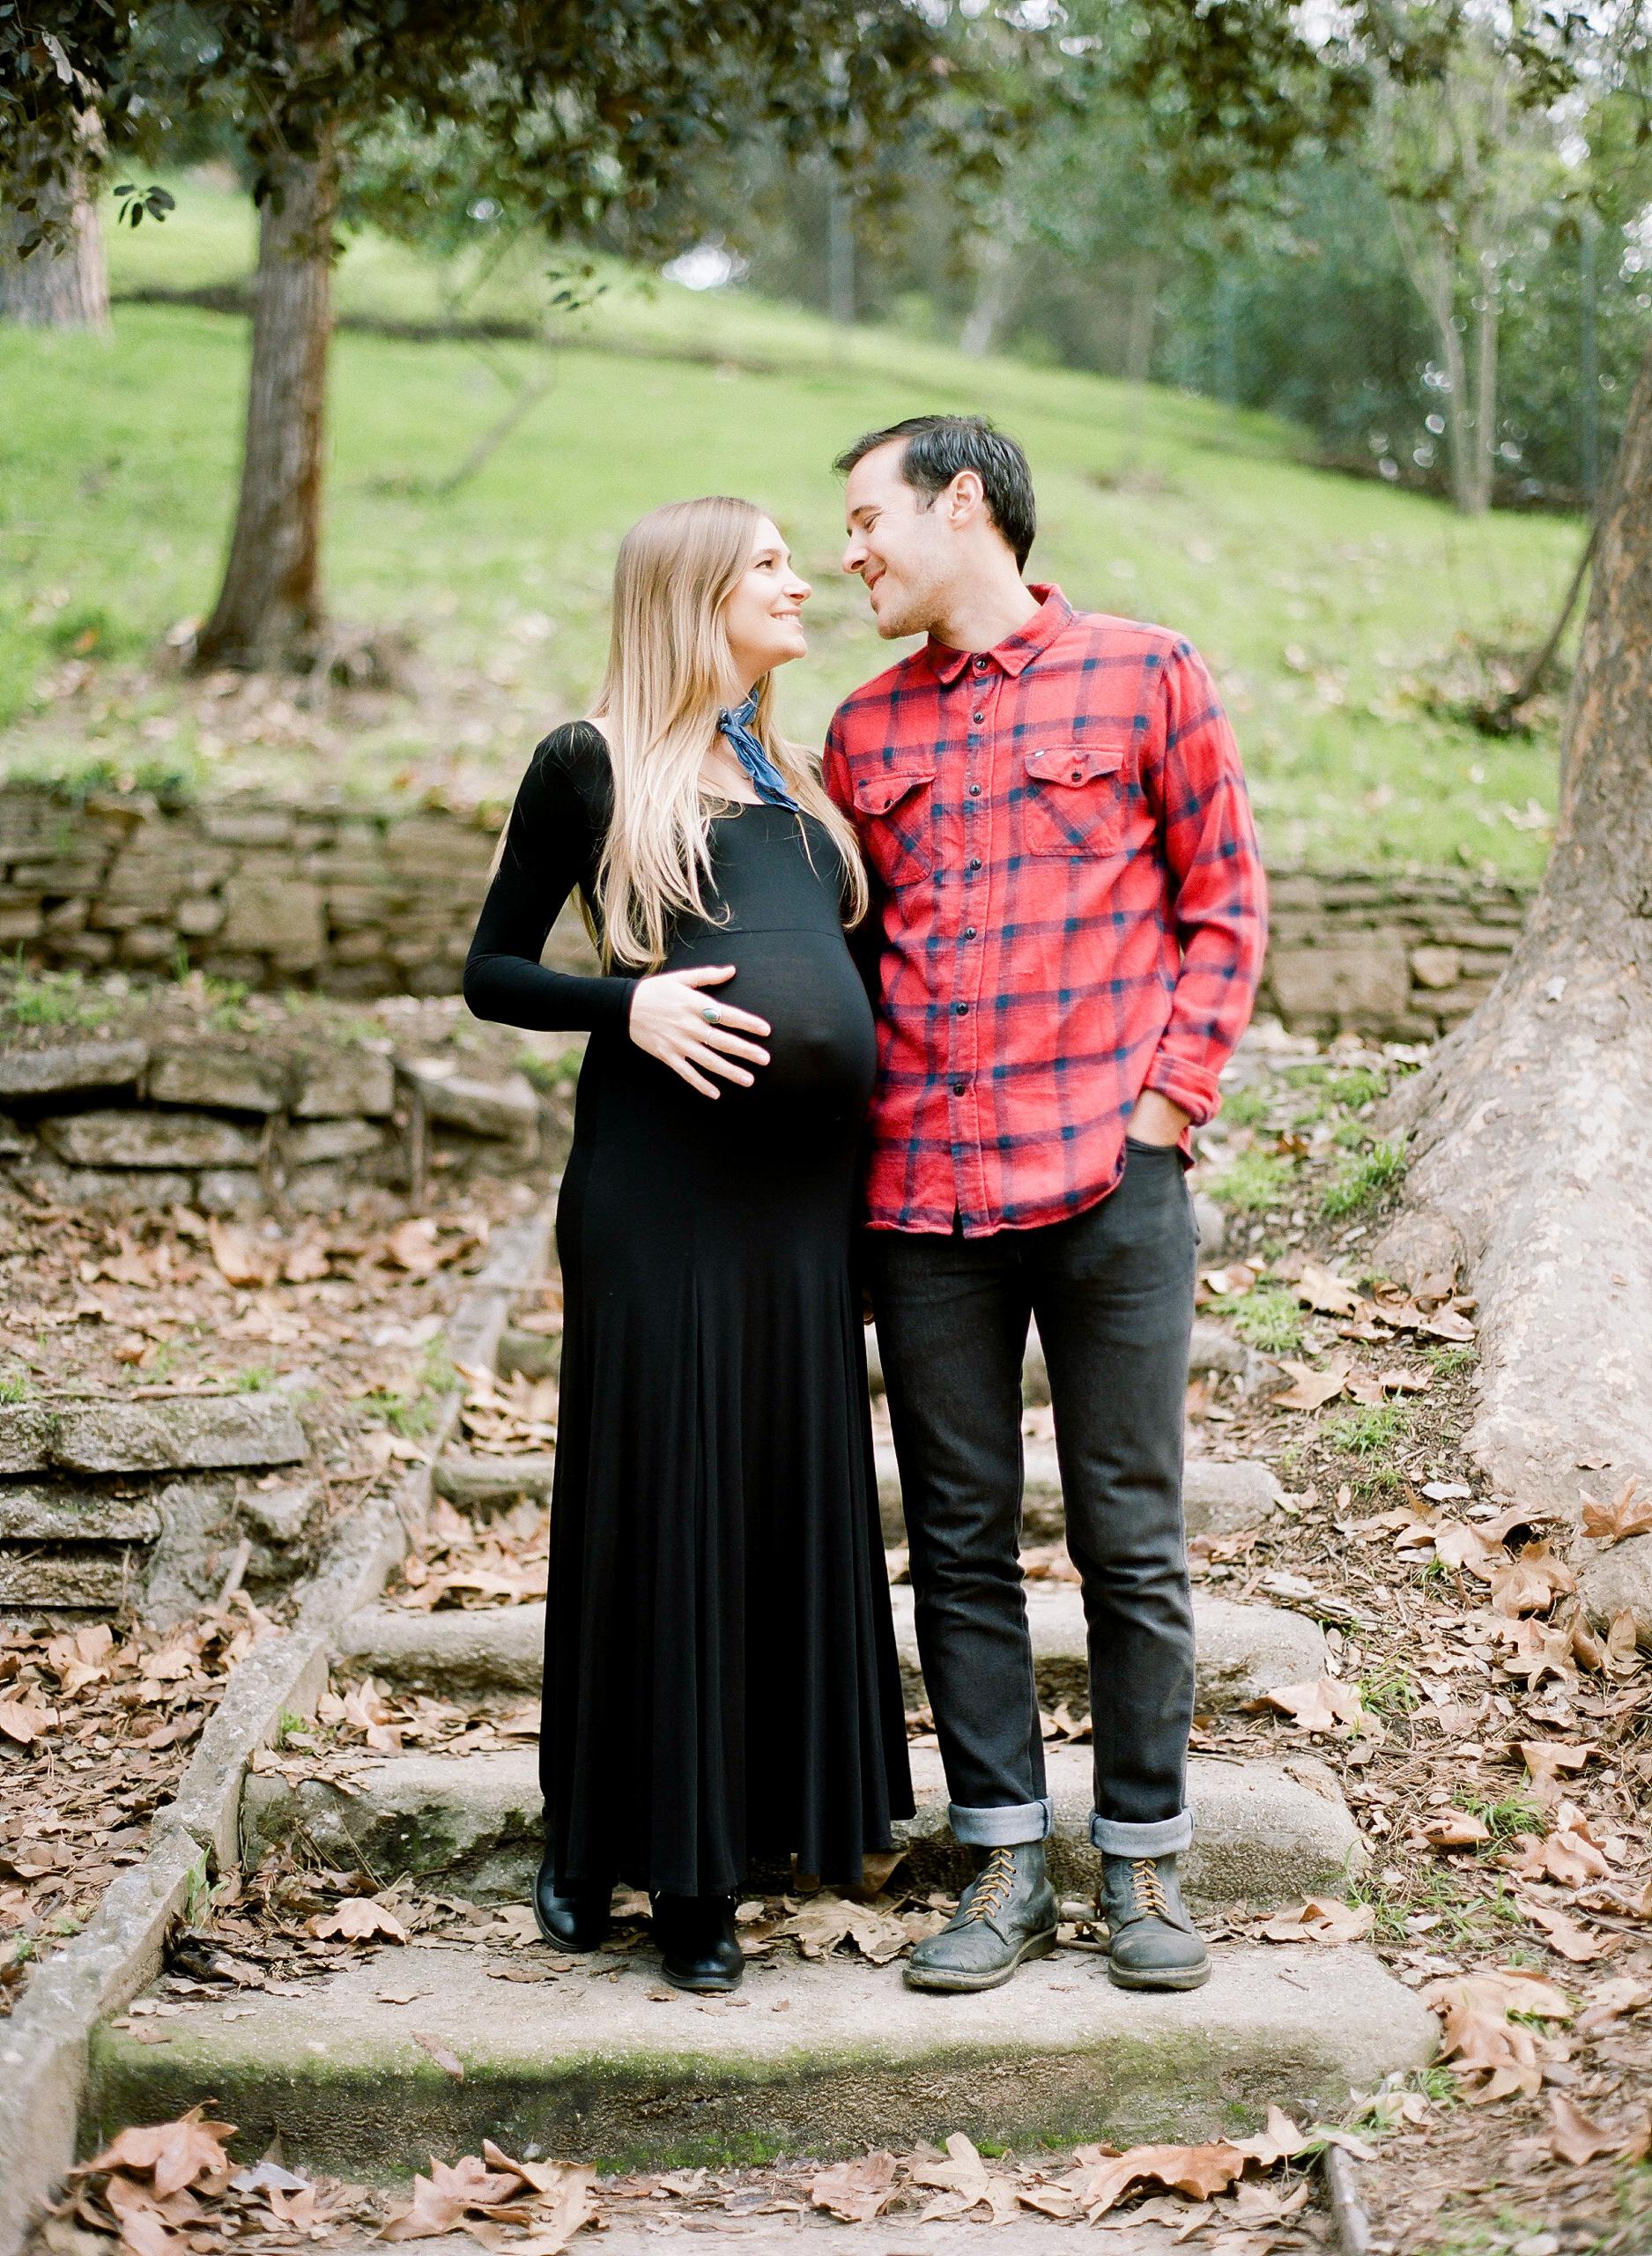 Chrissy & David Maternity Session-36.jpg